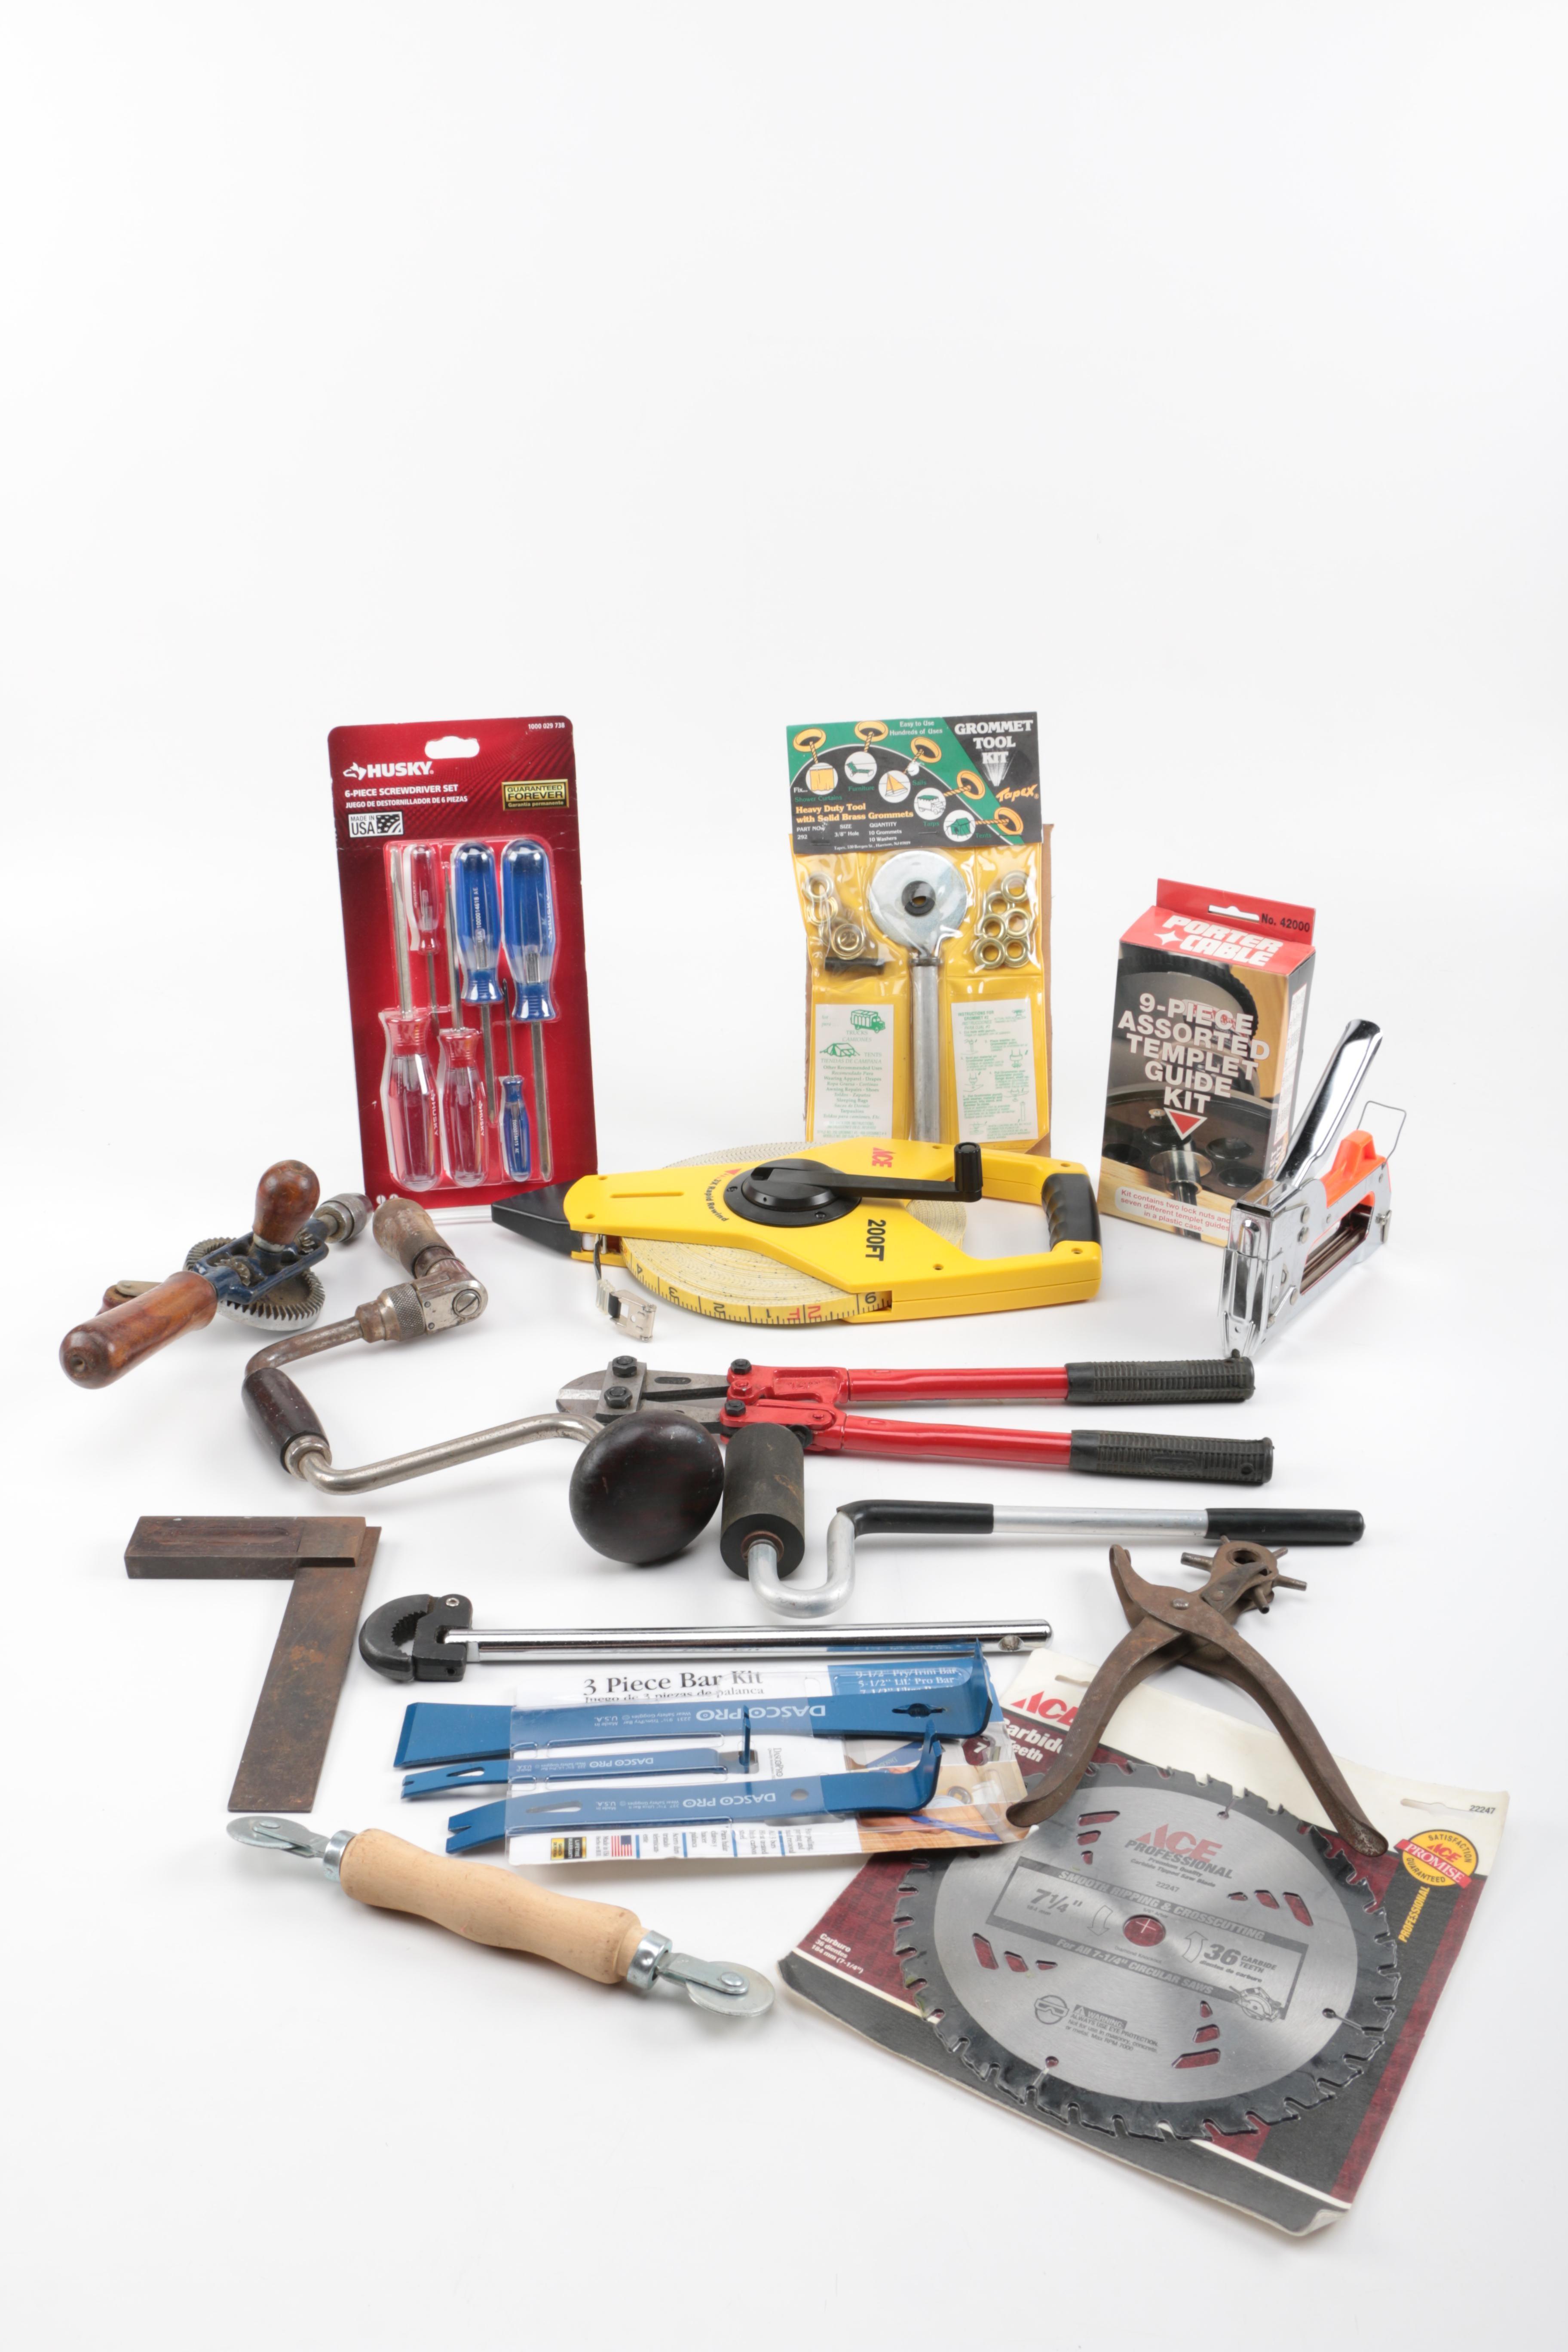 Assortment of Carpenter's Tools